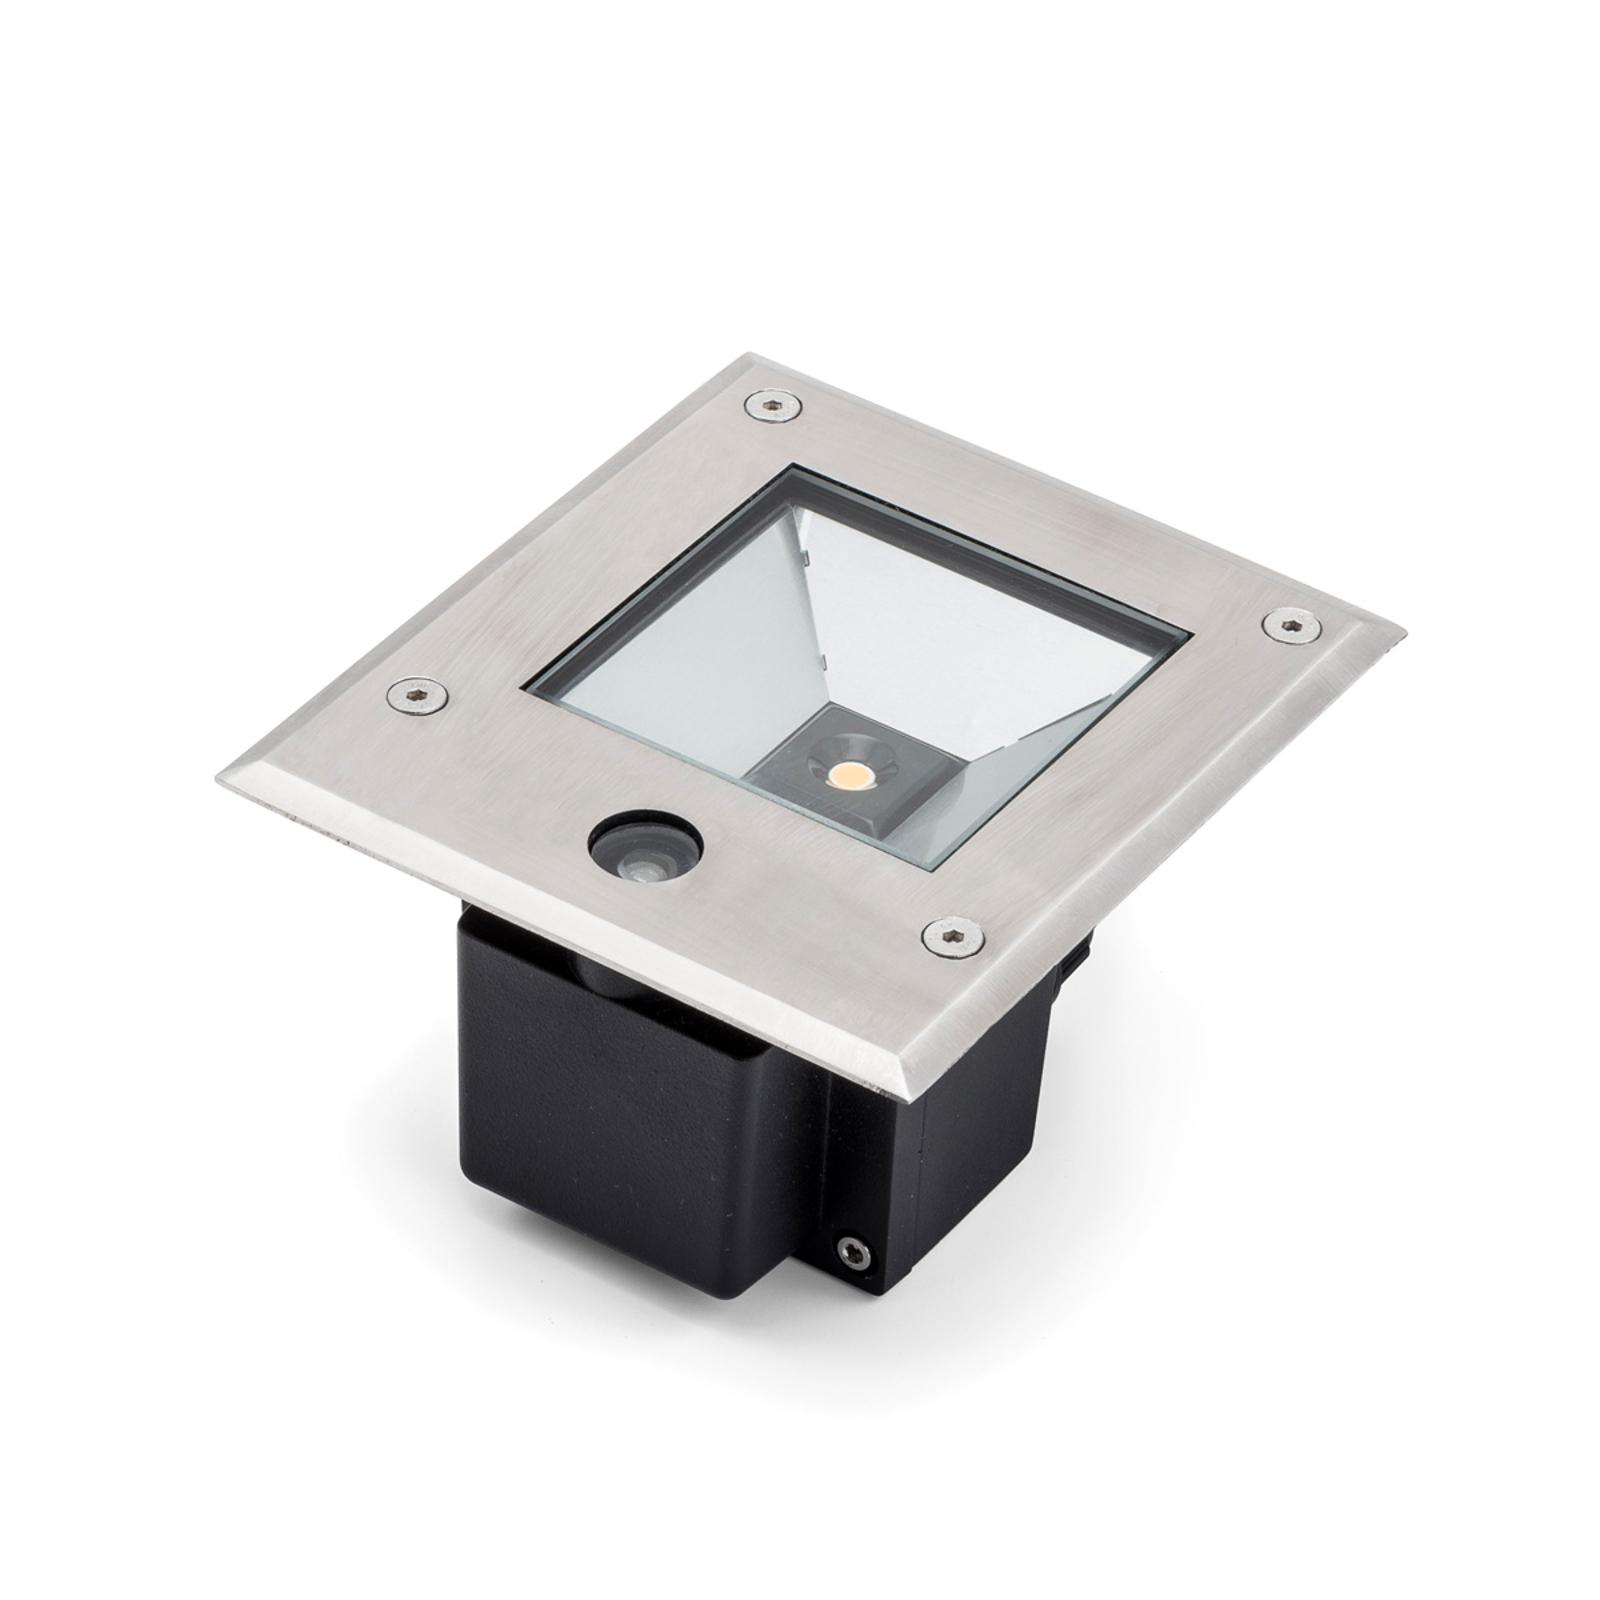 Dale LED grondspot 6 W schemersensor